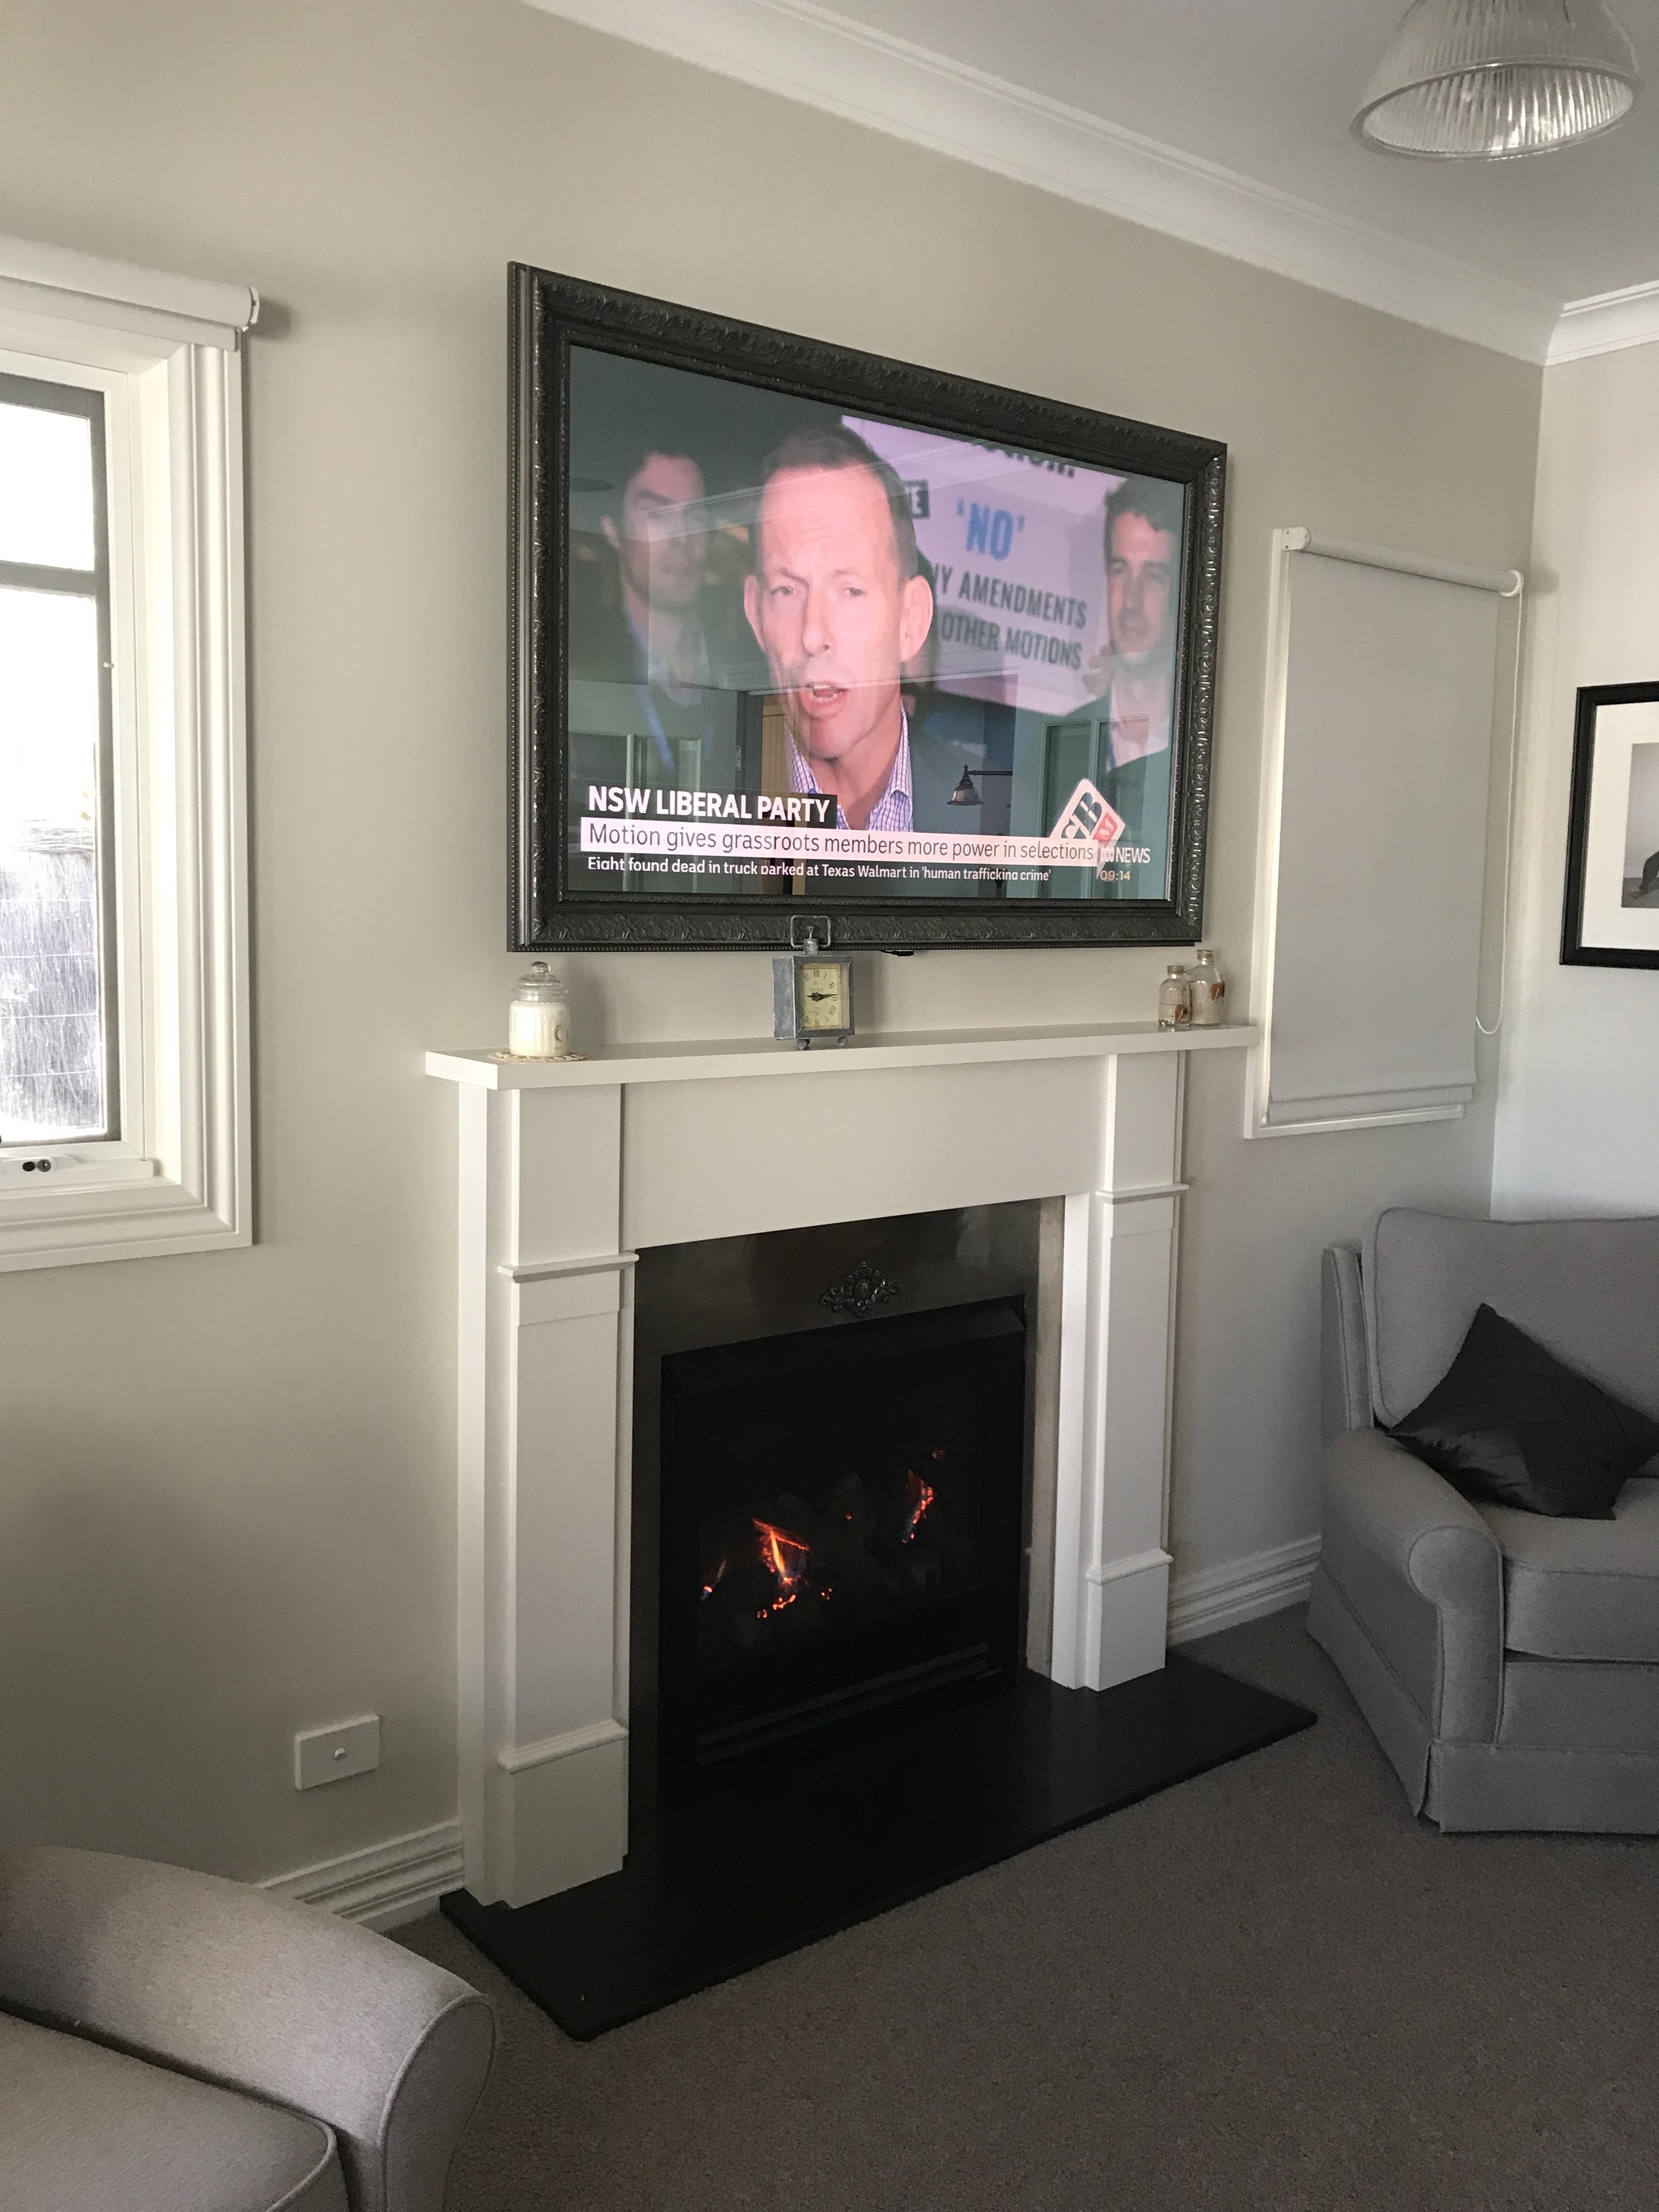 Tv Wall Hanging 1 Tv Guy Hang My Tv Installation Price